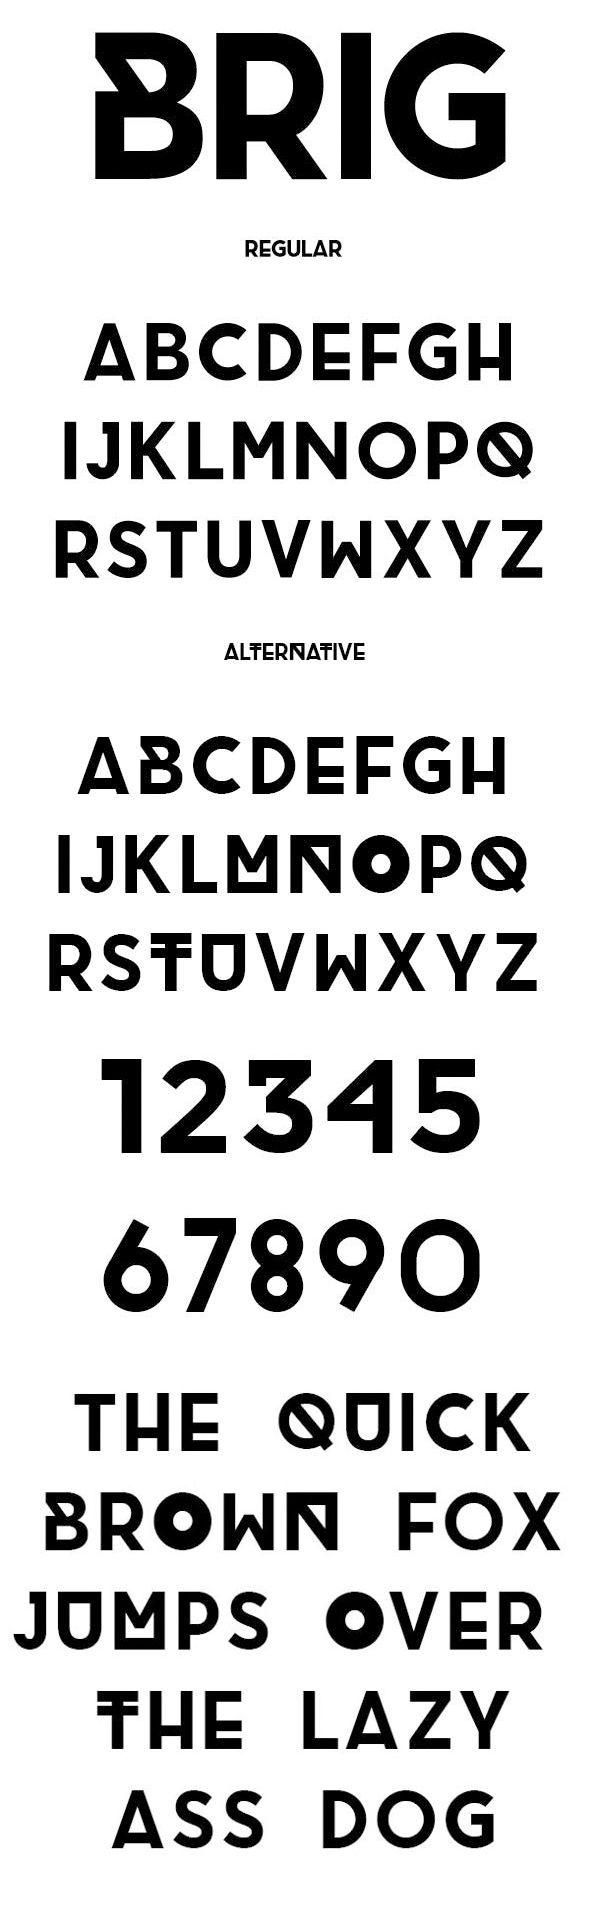 Web design freebies, BRIG - Free Font